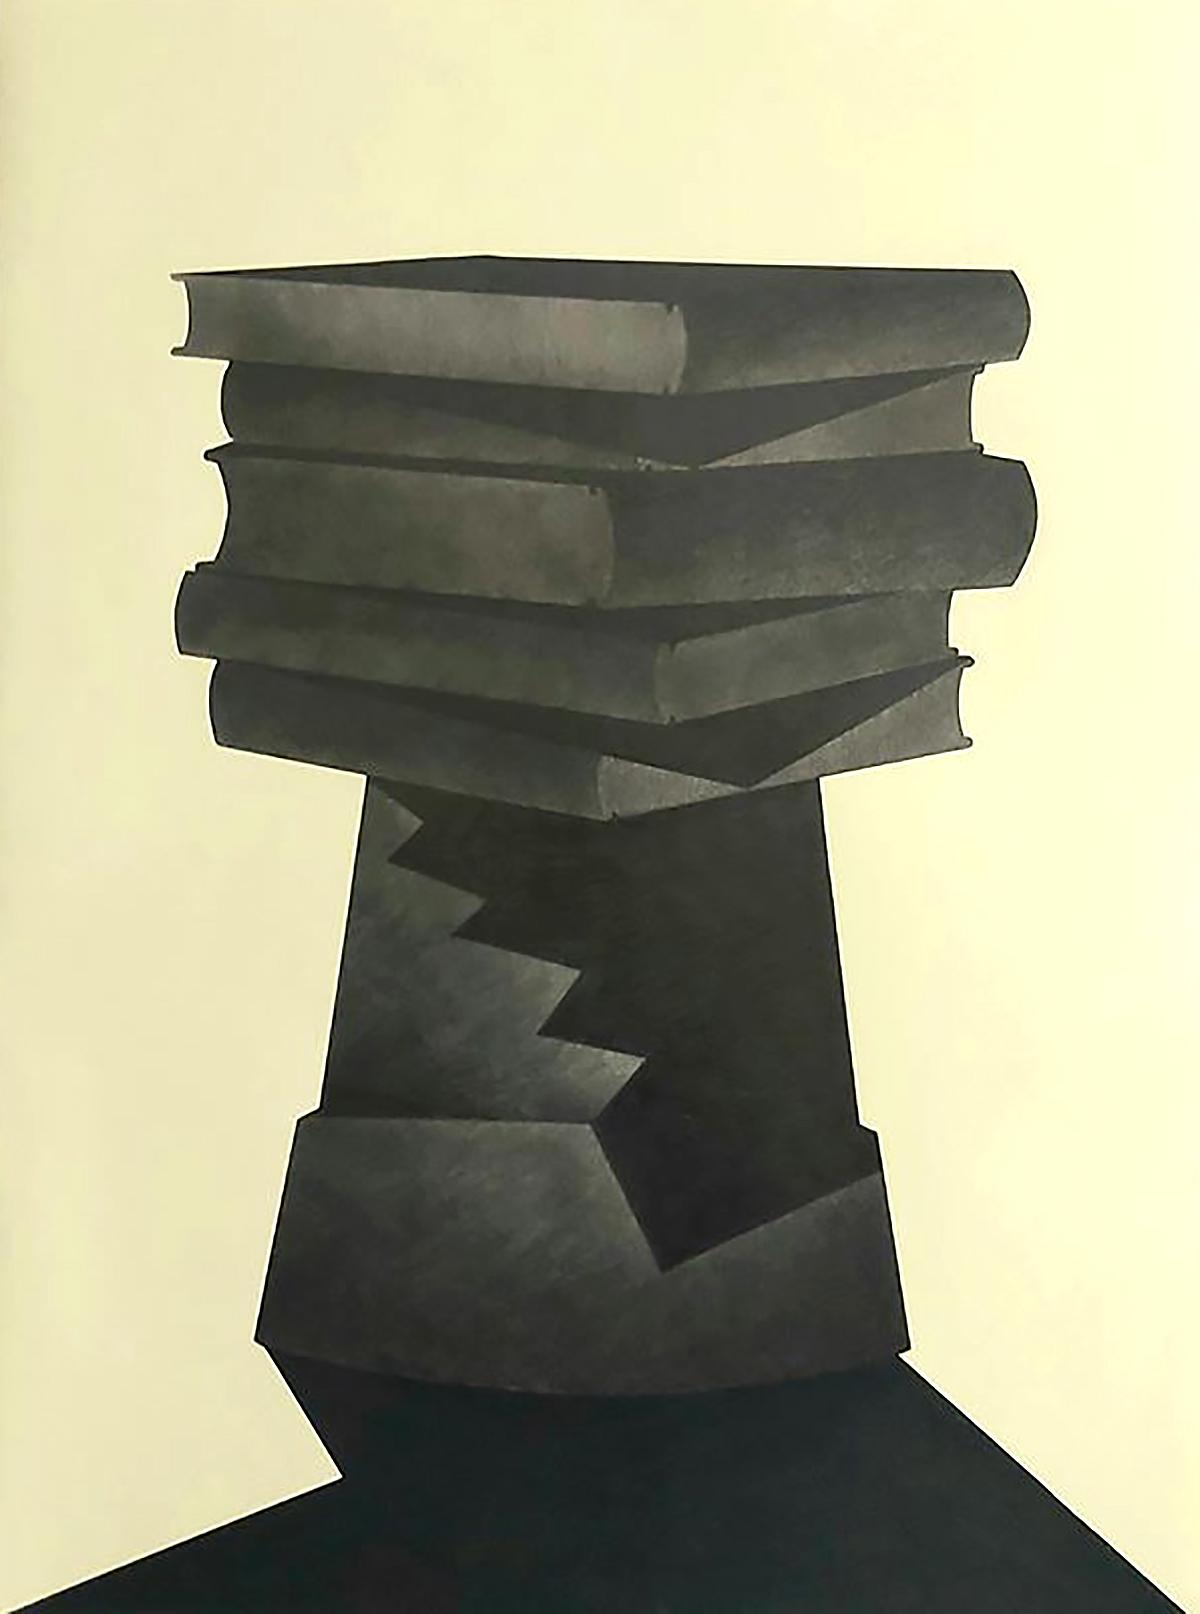 Sean Ellcombe - Hardback Trap, graphite and soft pastel on paper